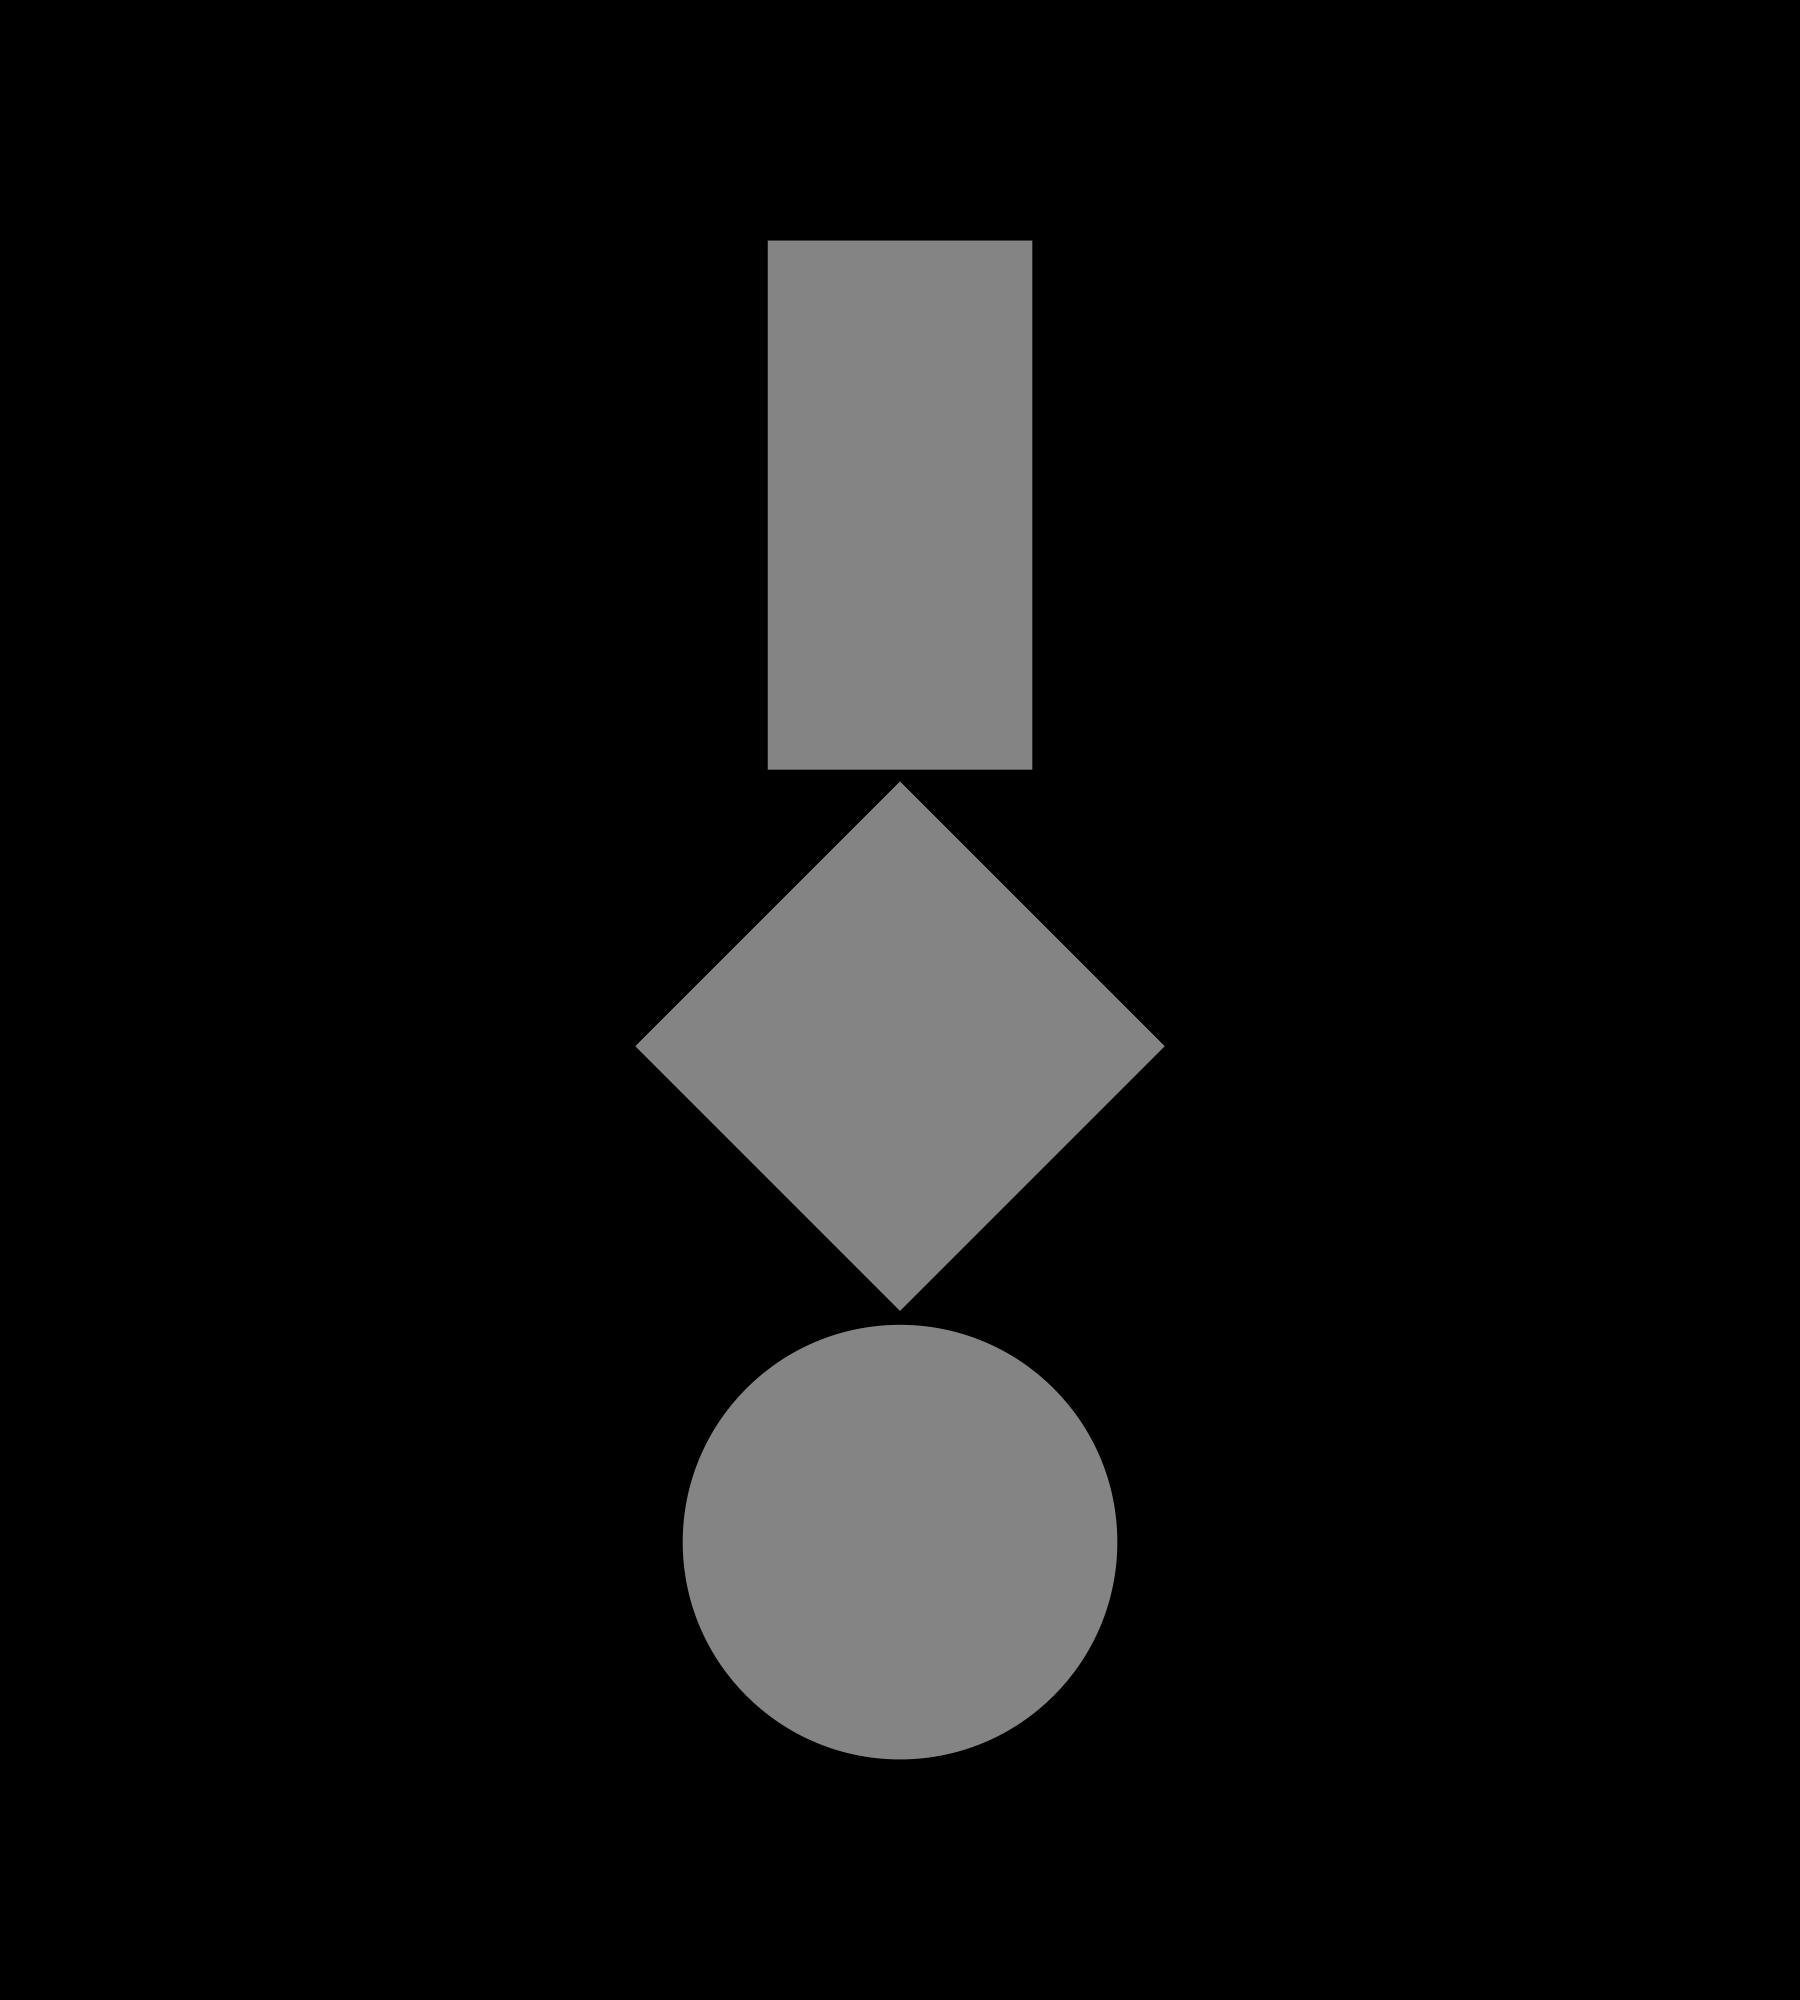 Drei geometrische Figuren